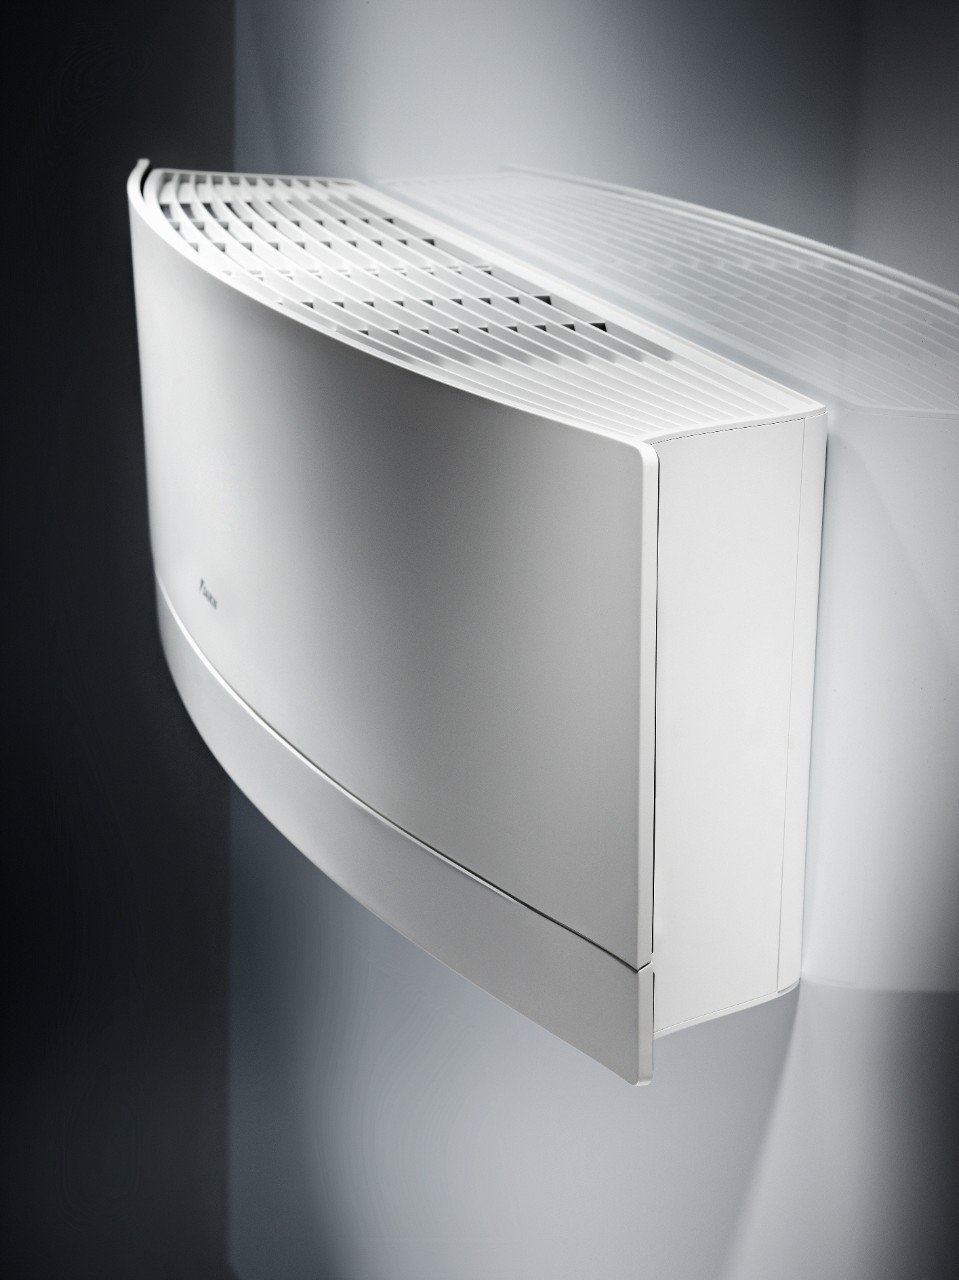 Climatiseur DAIKIN bisplit réversible inverter 2MXM50M9.